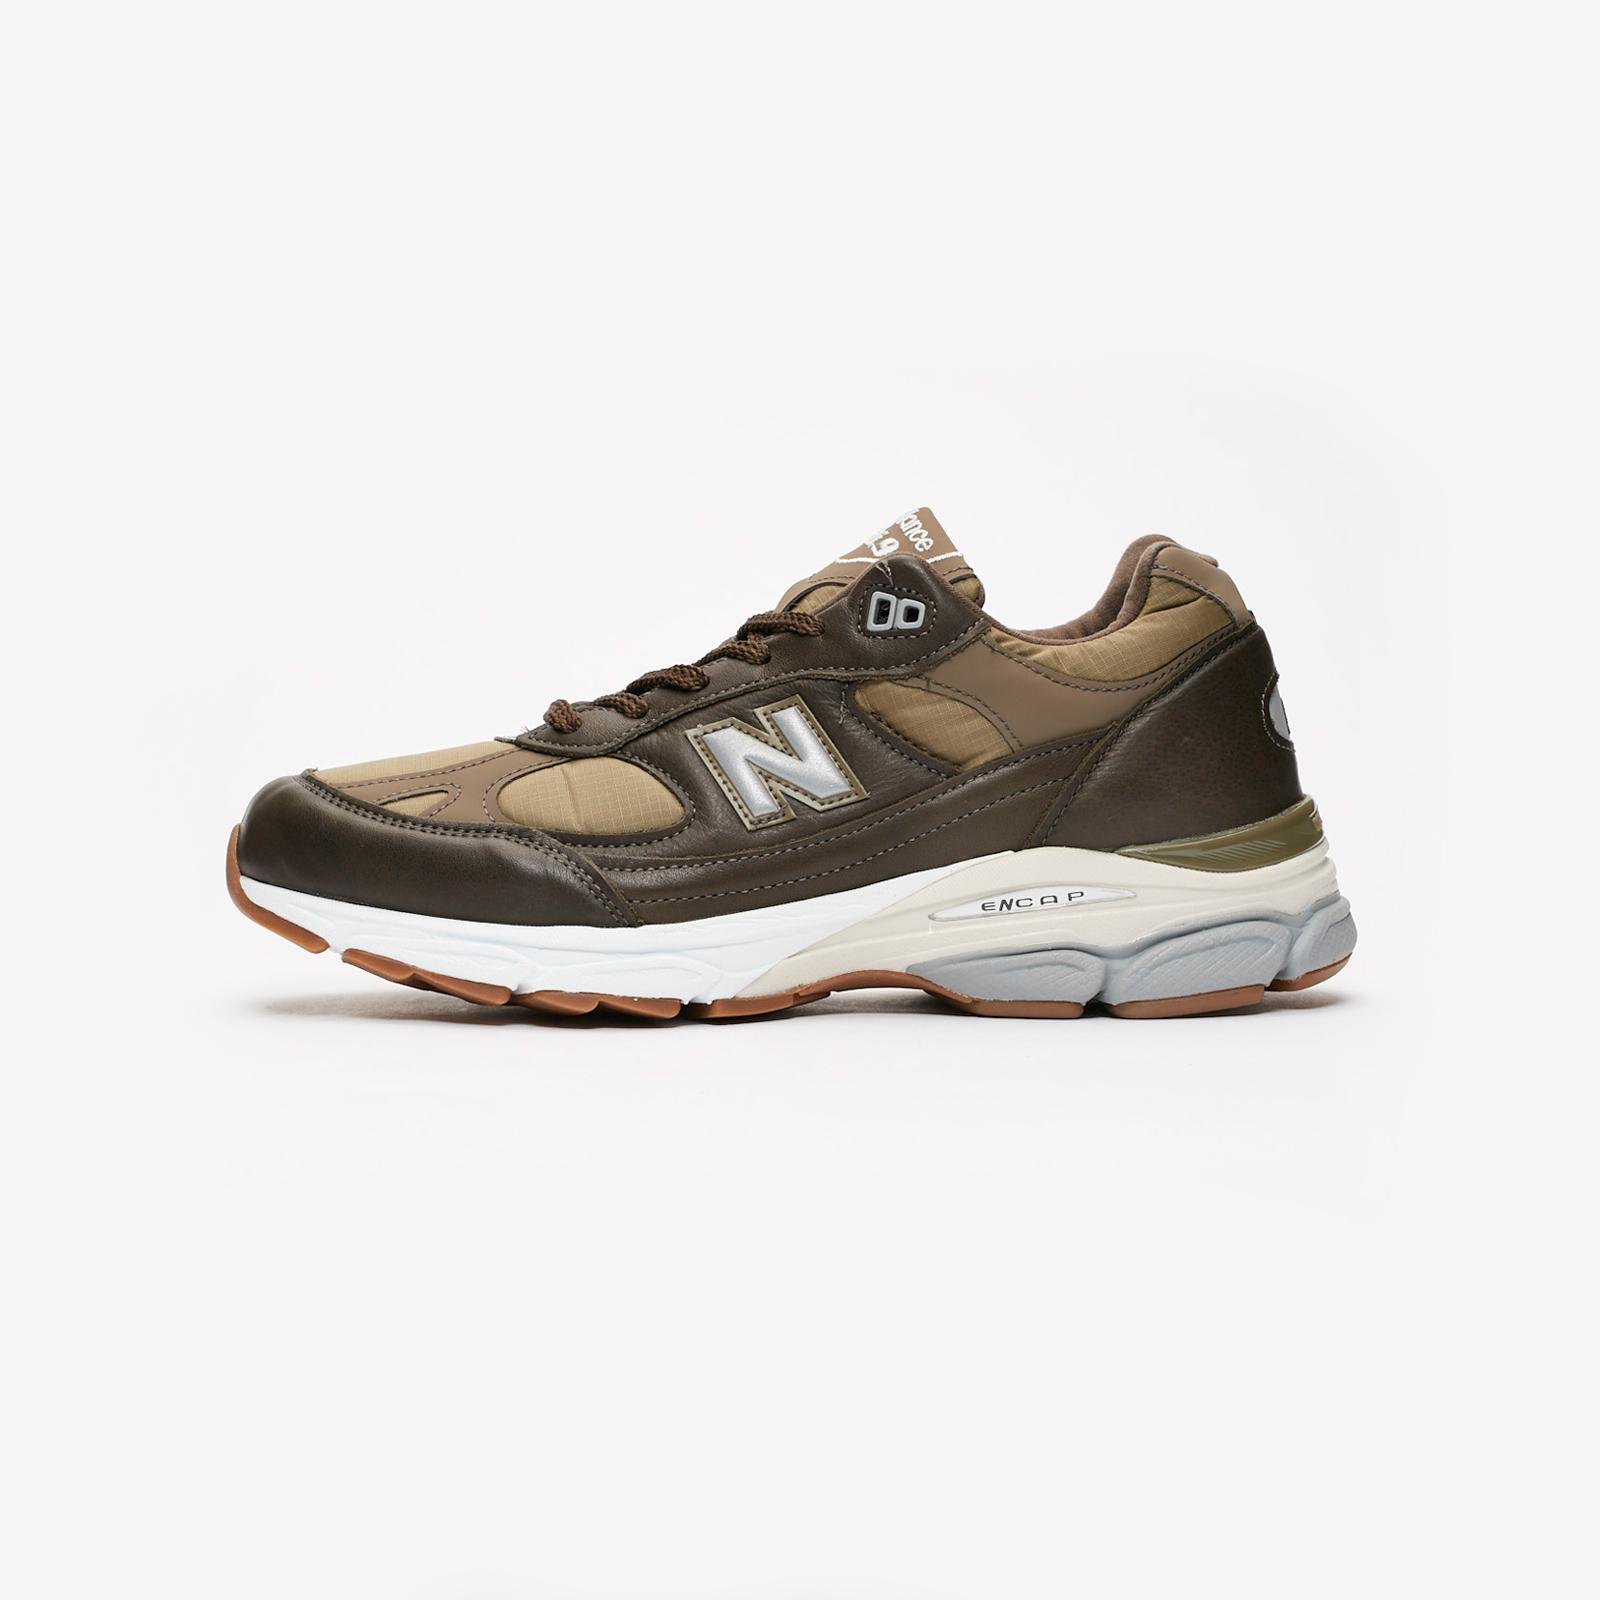 New Balance M9919 - M9919lp - SNS | sneakers & streetwear online ...